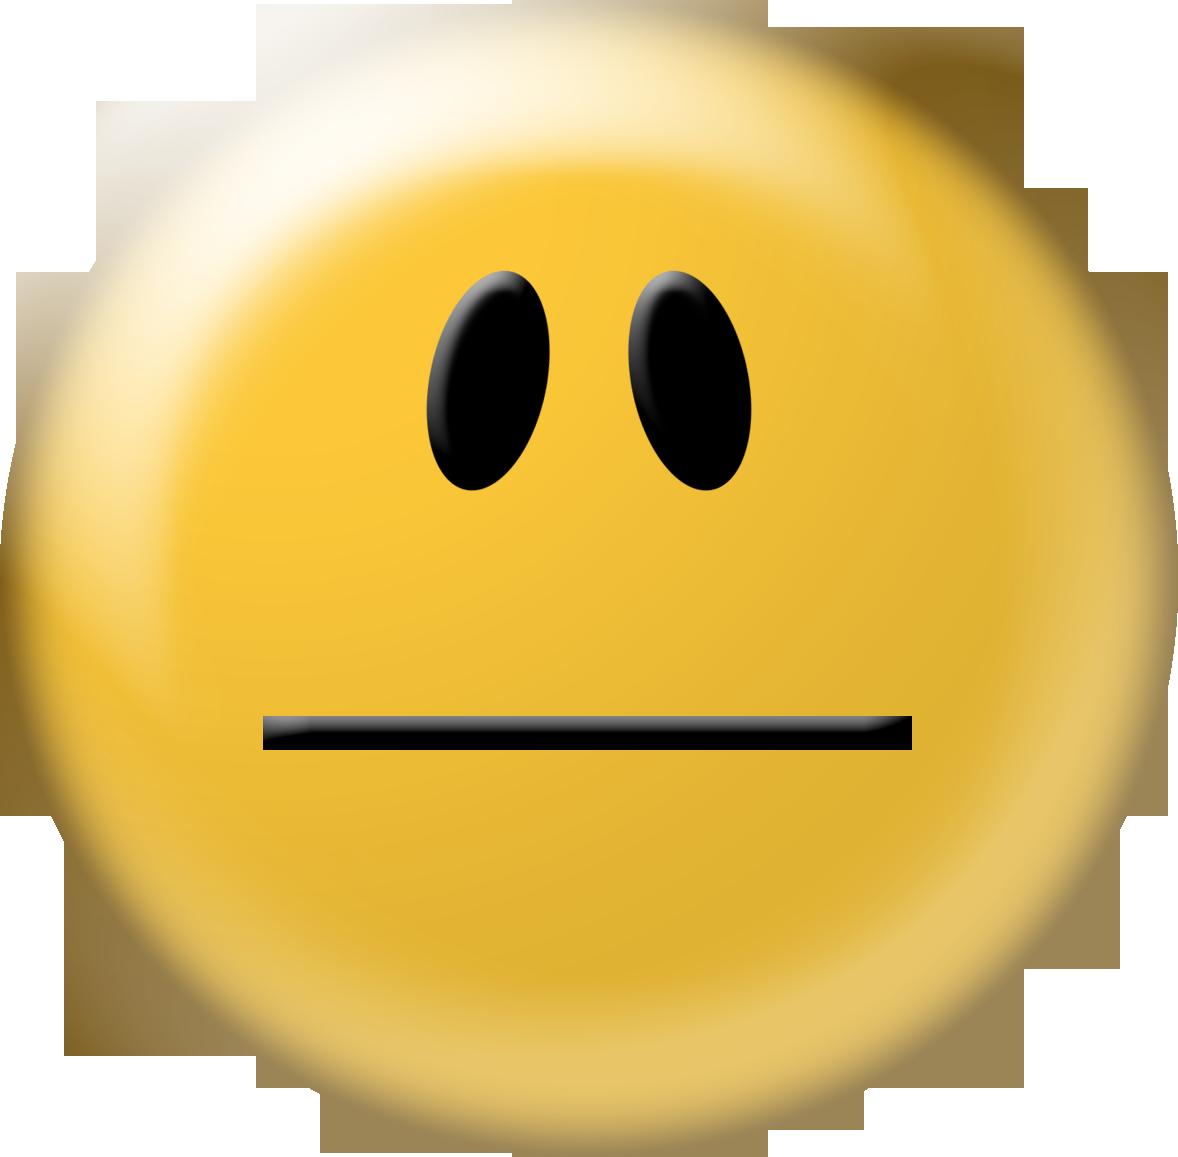 Neutral Smiley-Face Emoticon